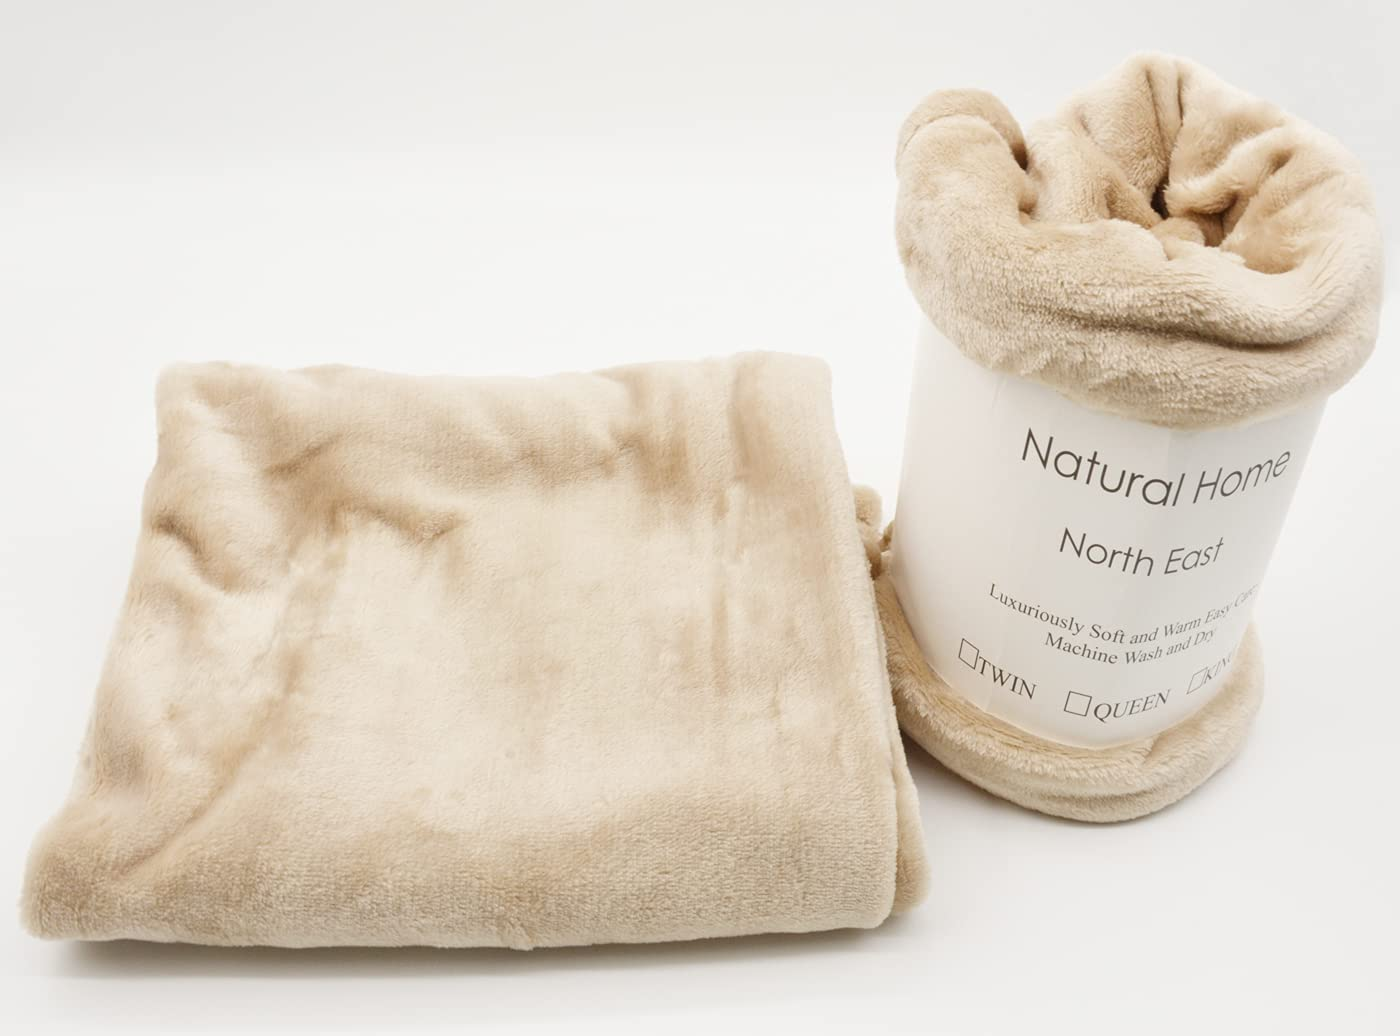 Microfiber Luxury Flannel Fleece Blanket Throw and Lightweight Max Bargain 77% OFF